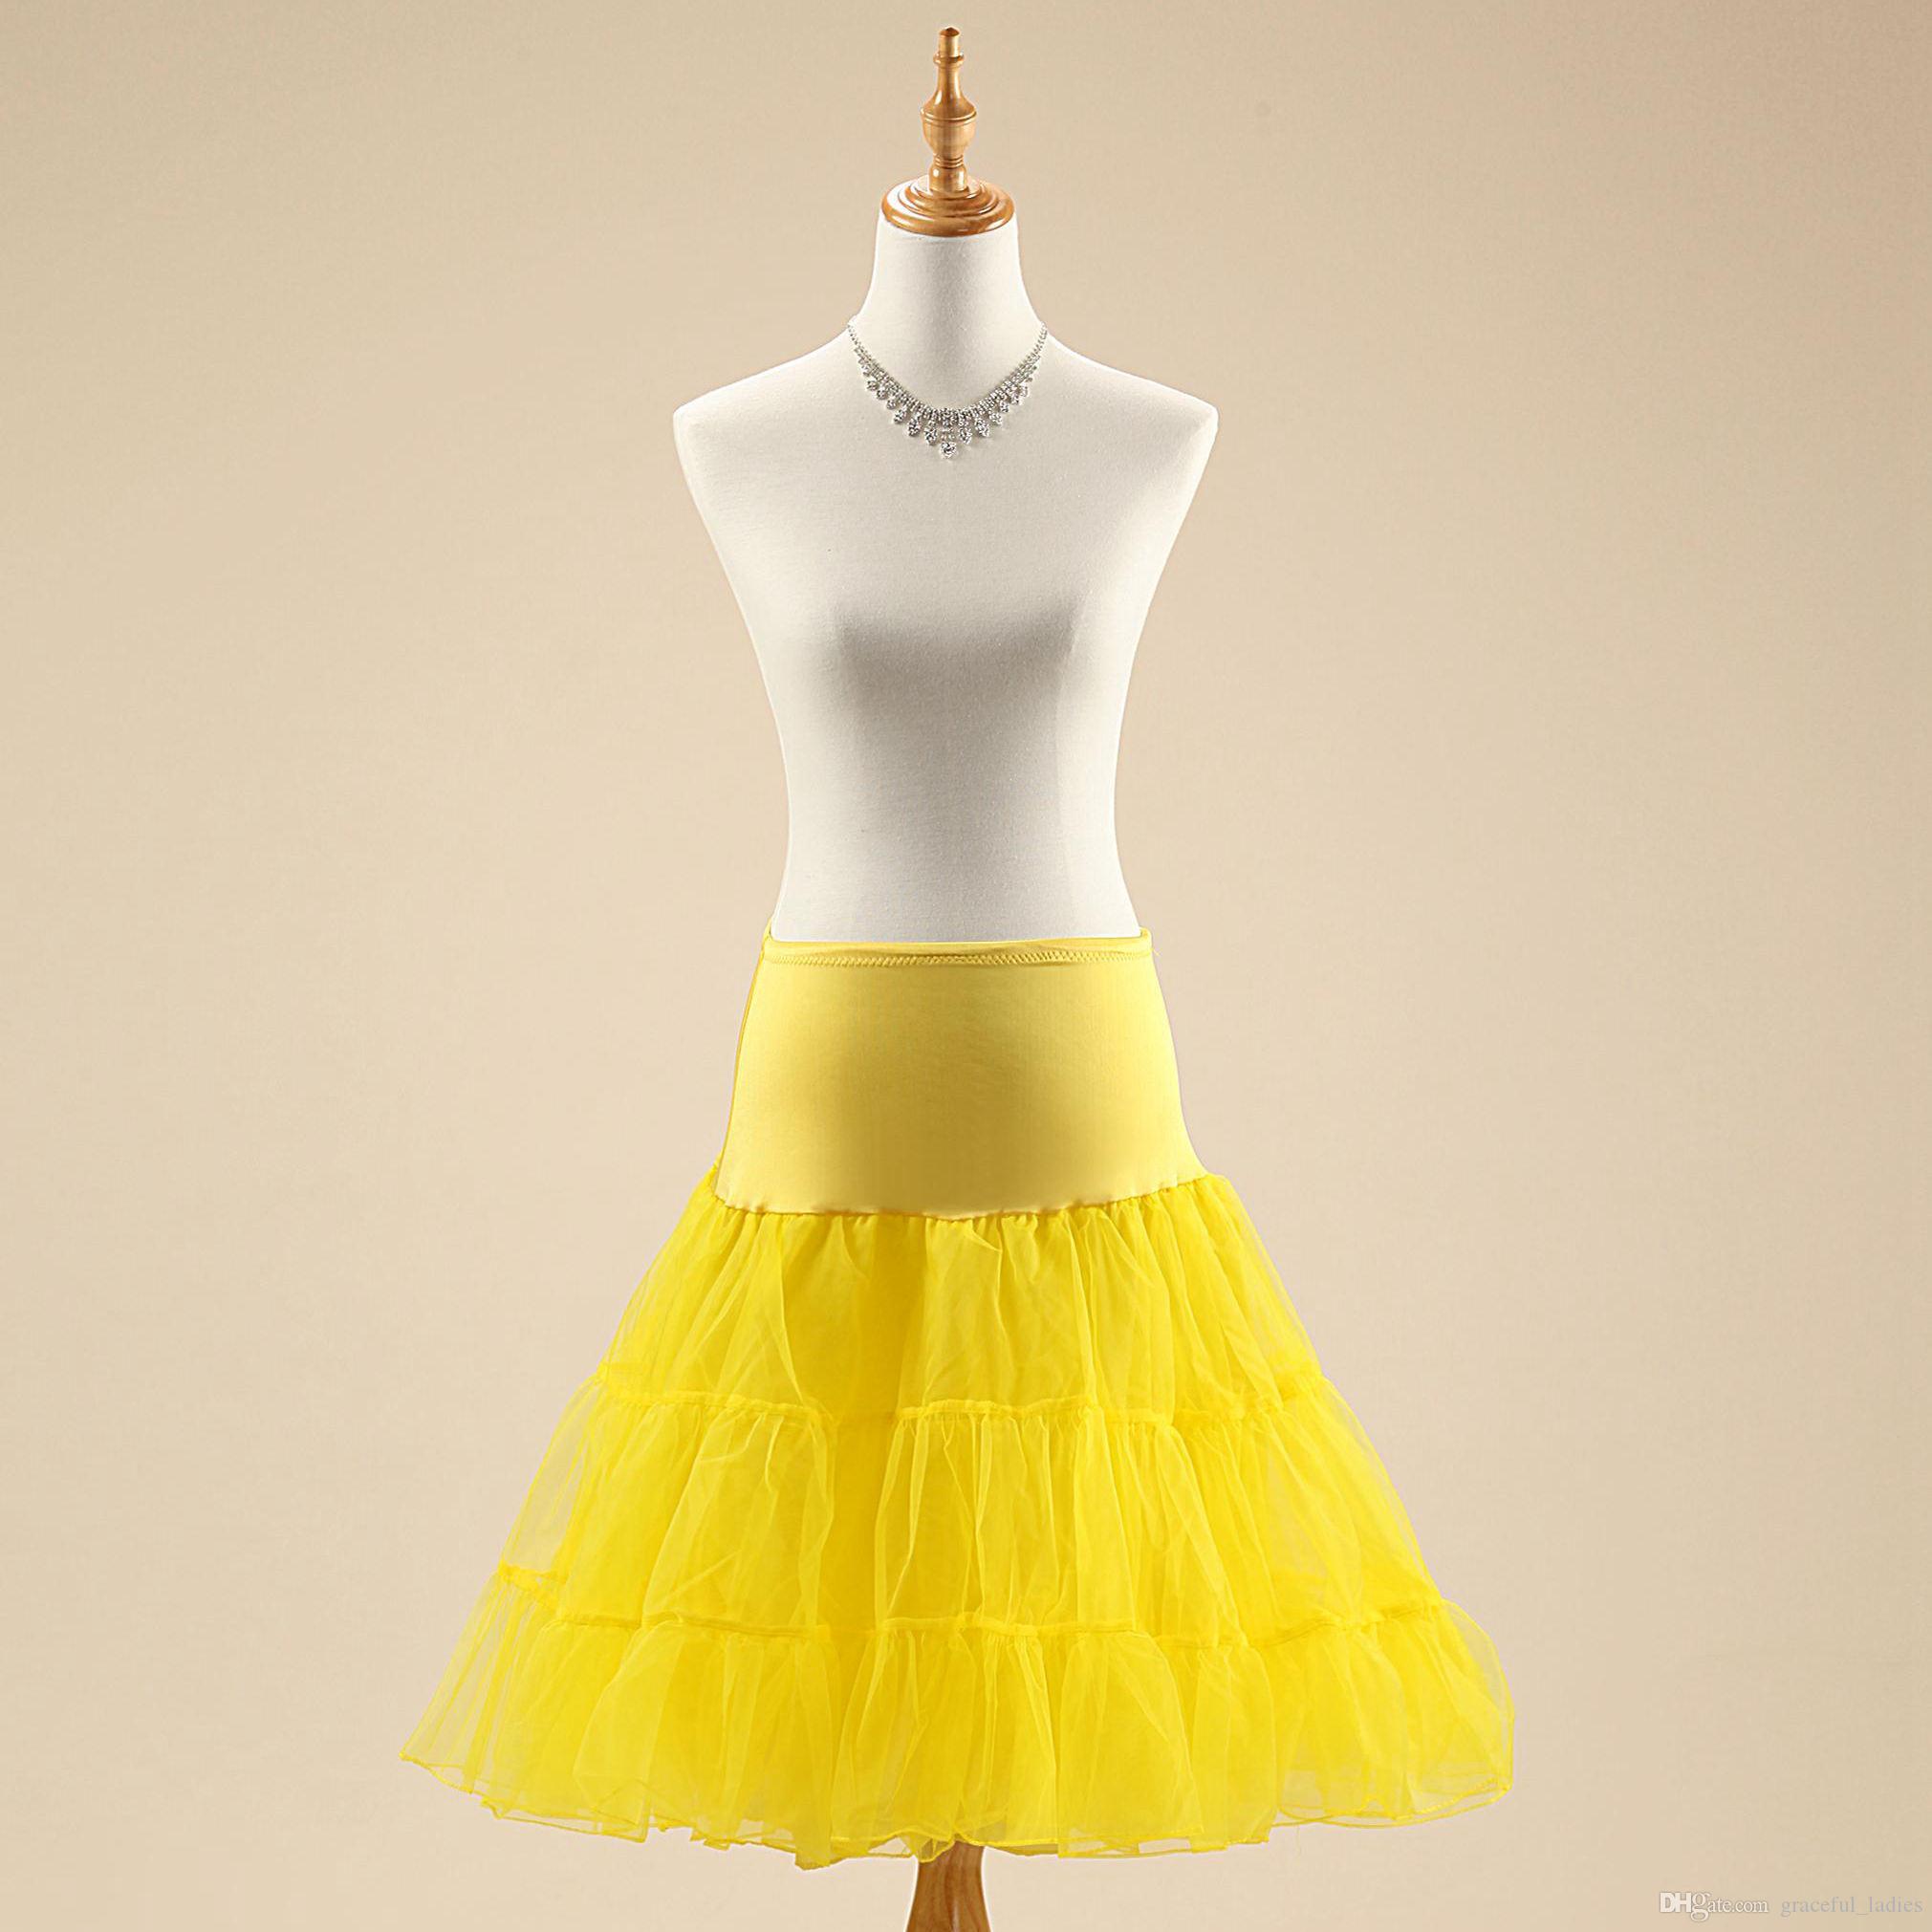 Color Wedding Petticoats Gown Bridal Dress Petticoat 3 Tier Knee